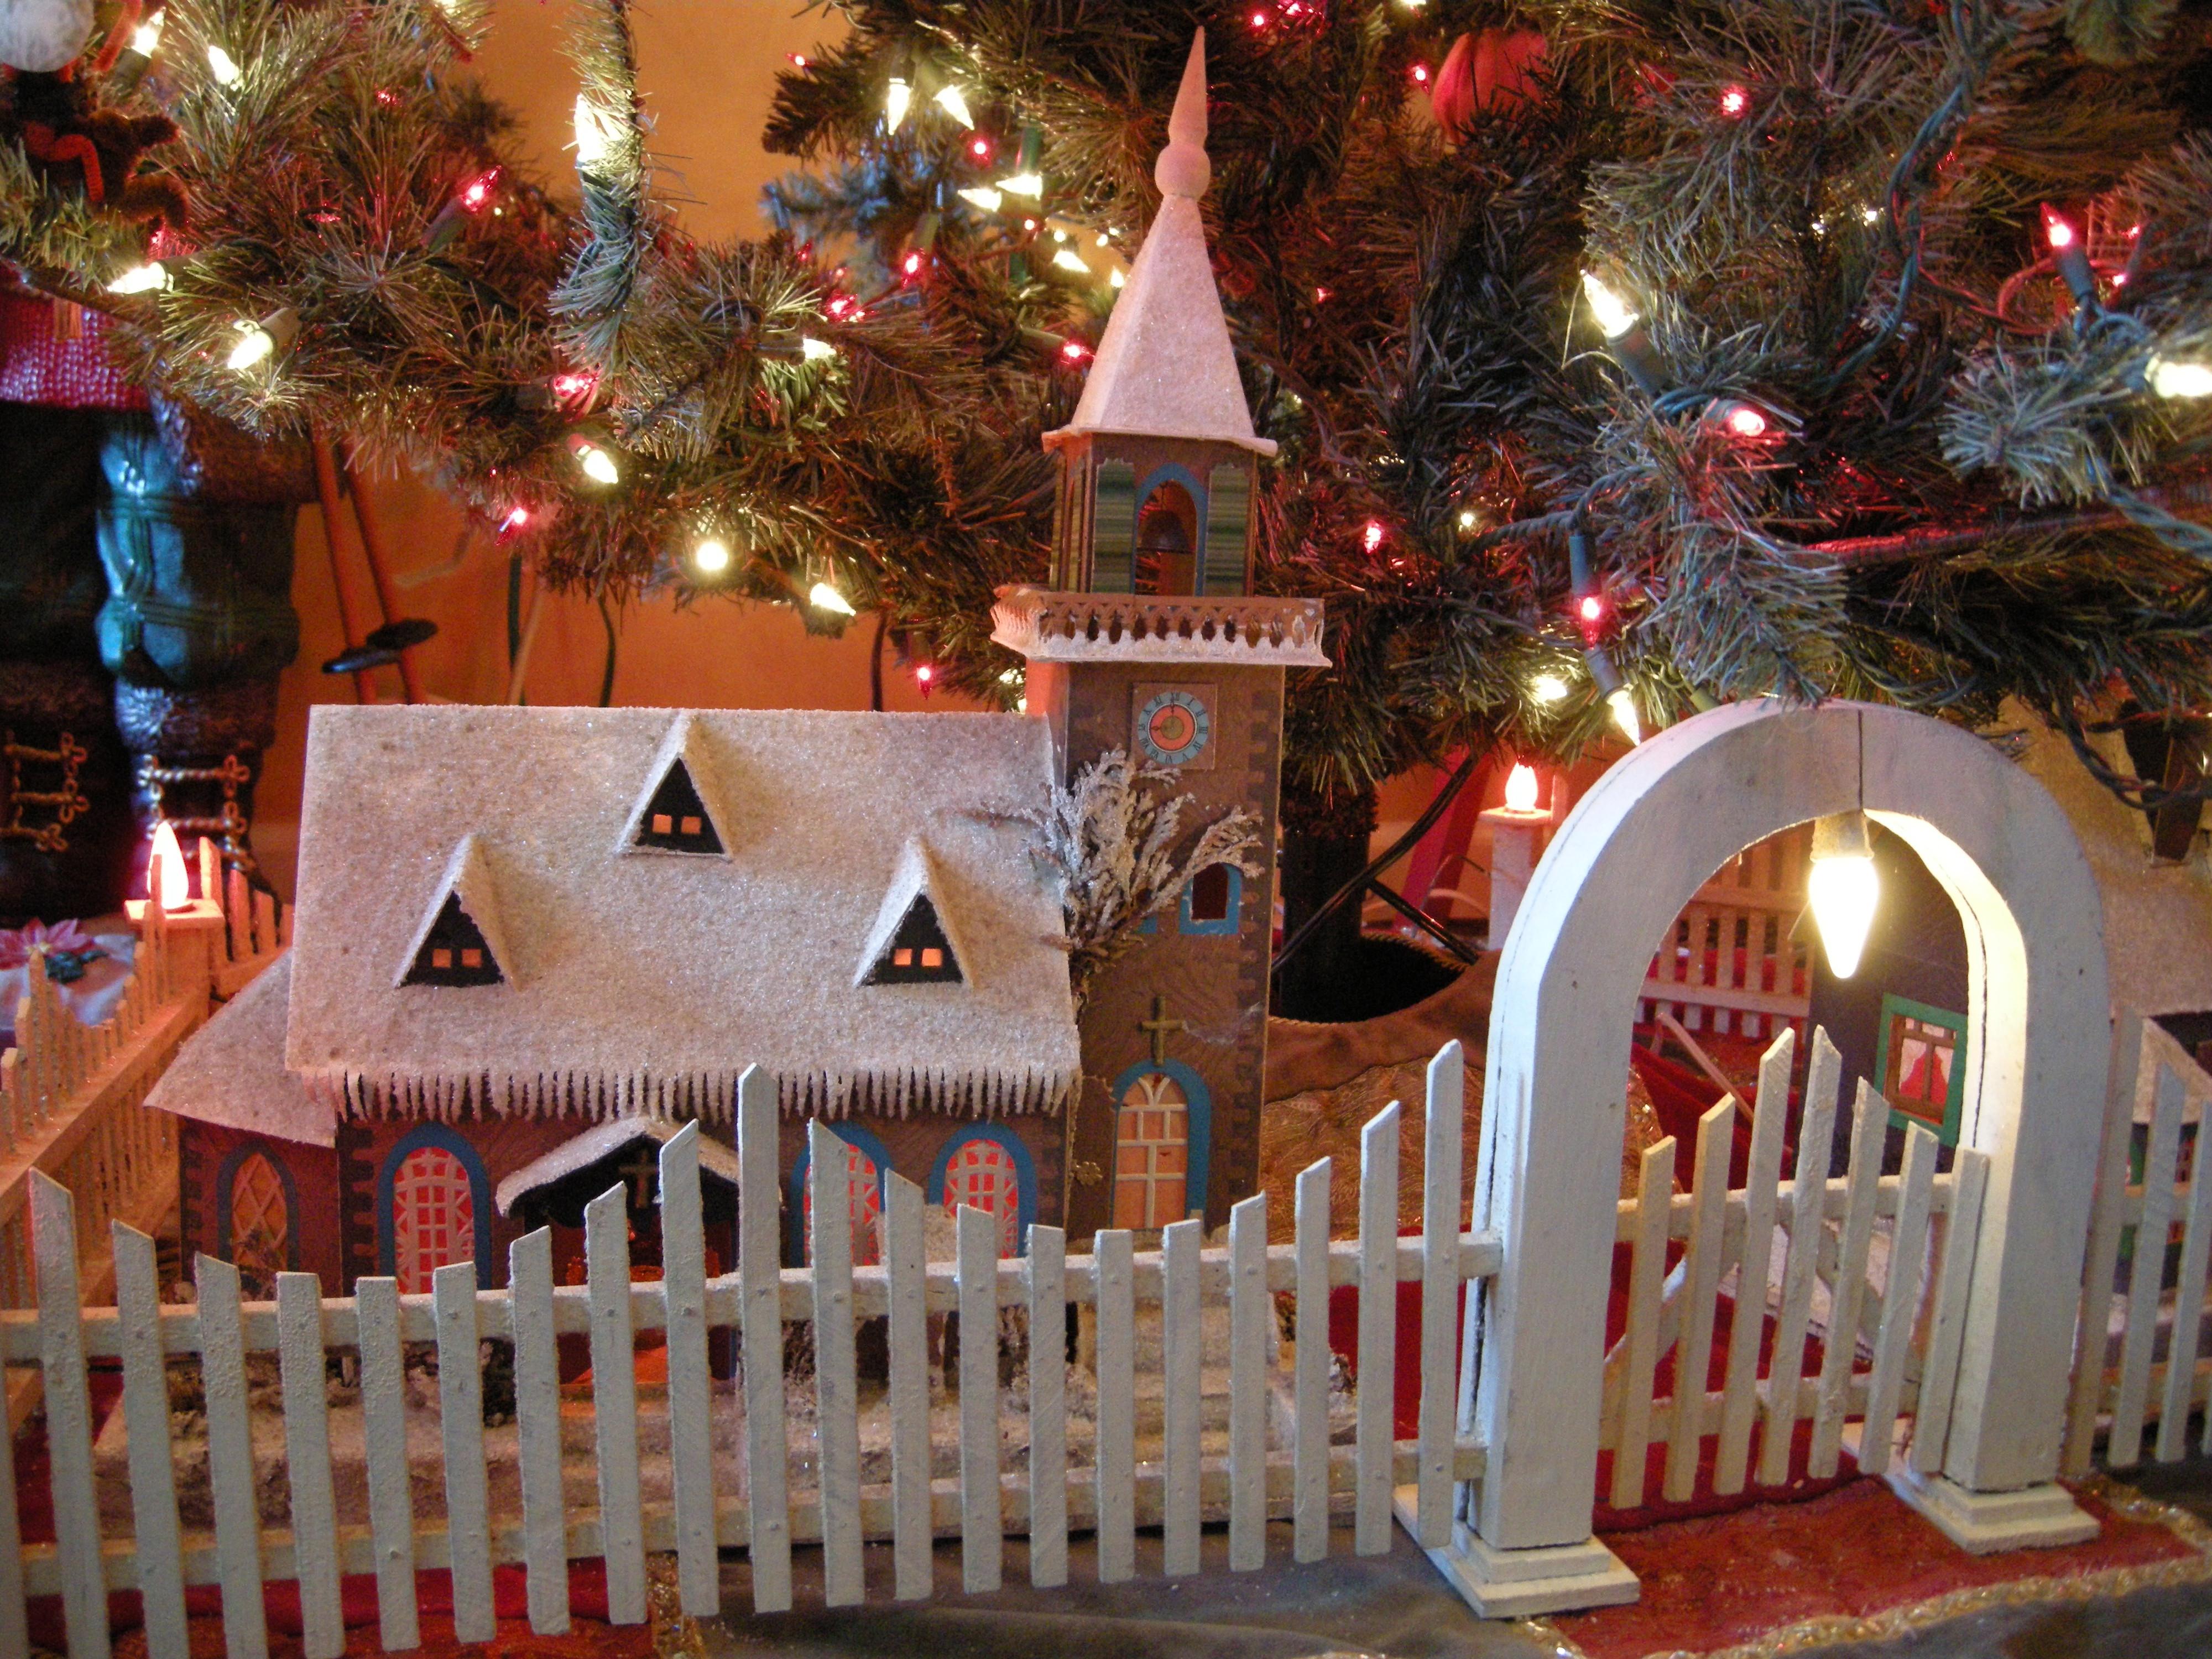 Christmas Tree Fence Indoors  Antique Christmas Tree Fences